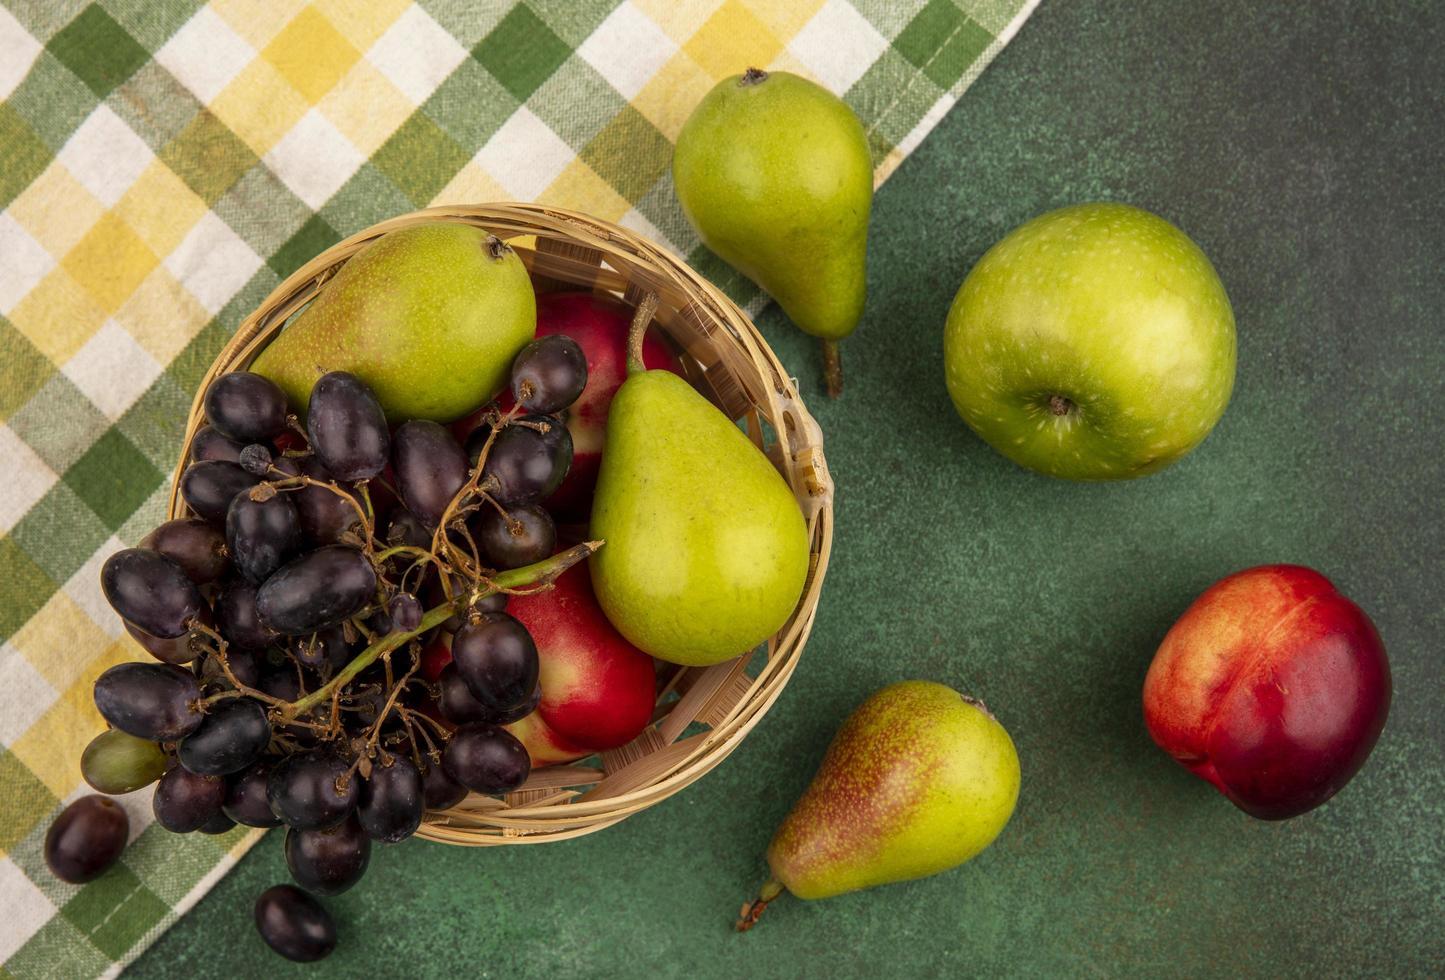 fruta variada sobre fondo verde foto